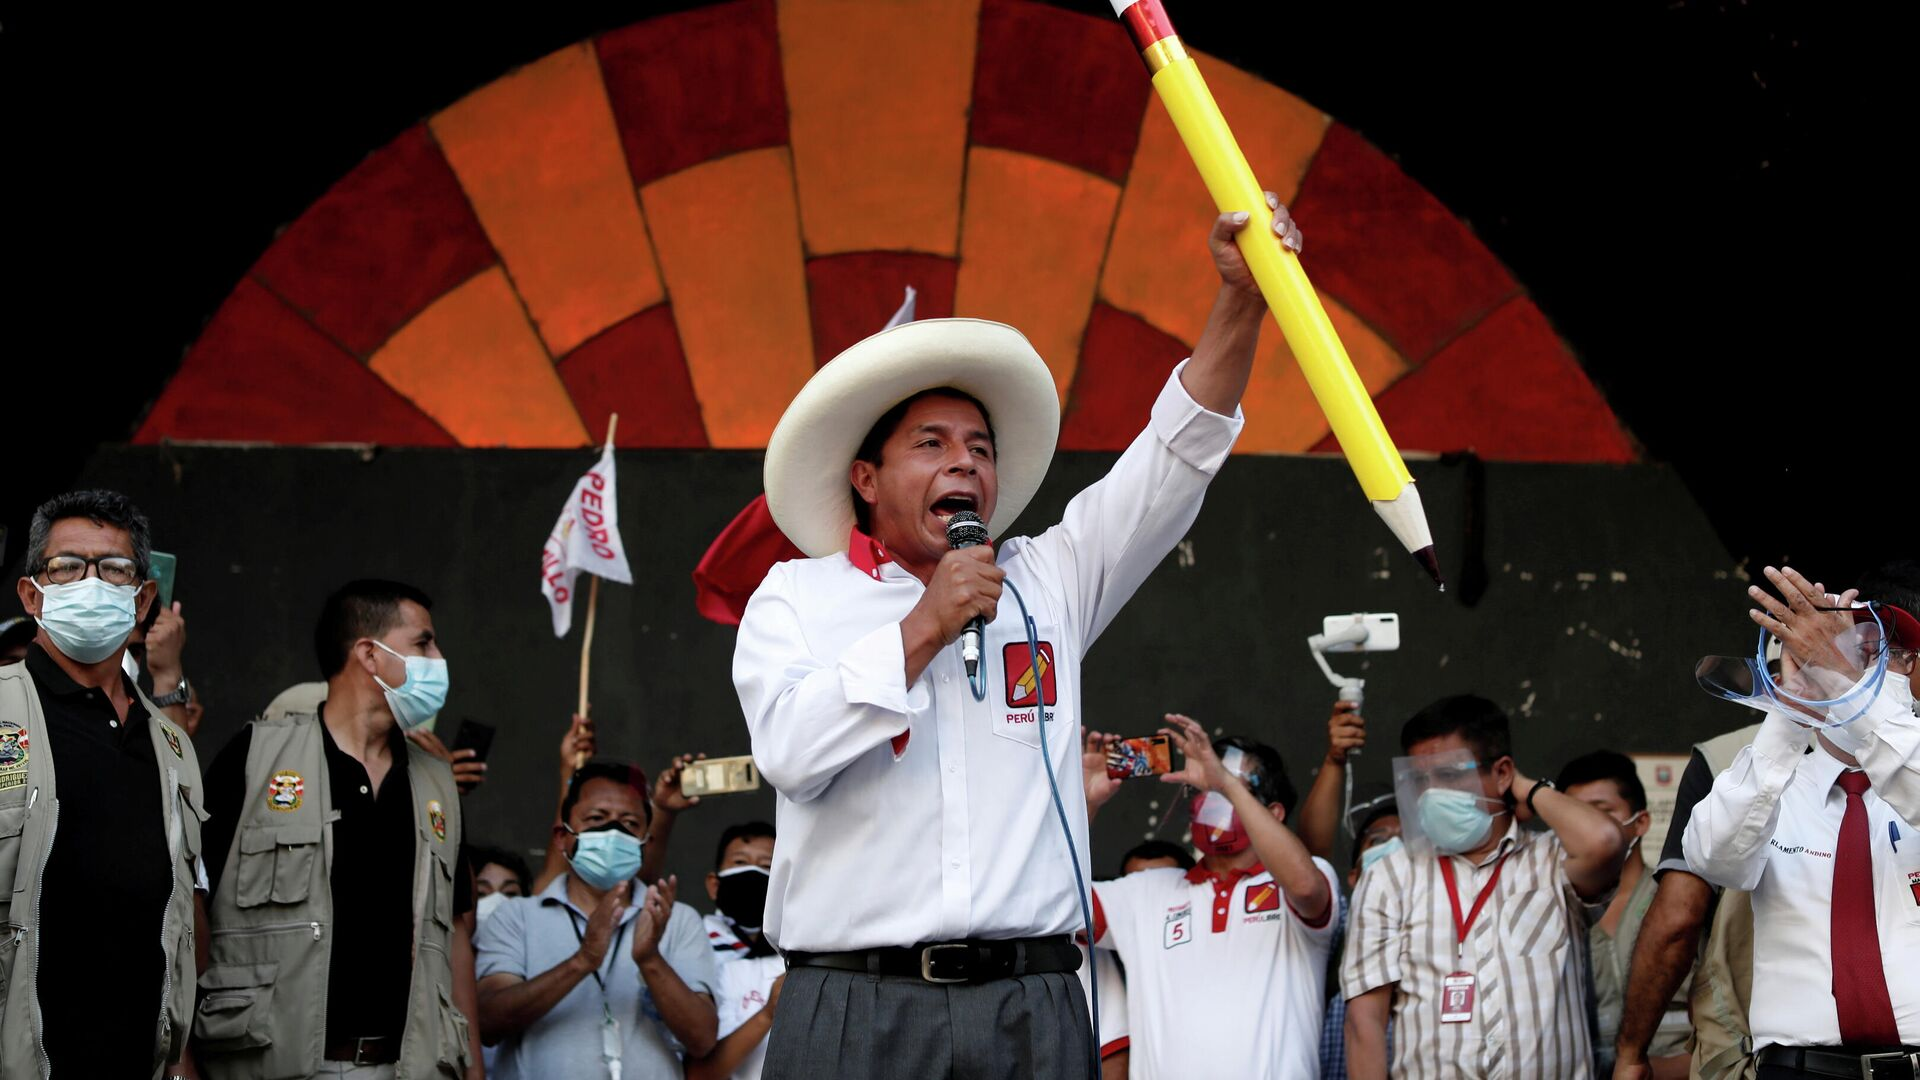 Pedro Castillo, candidato a la presidencia de Perú - Sputnik Mundo, 1920, 07.05.2021